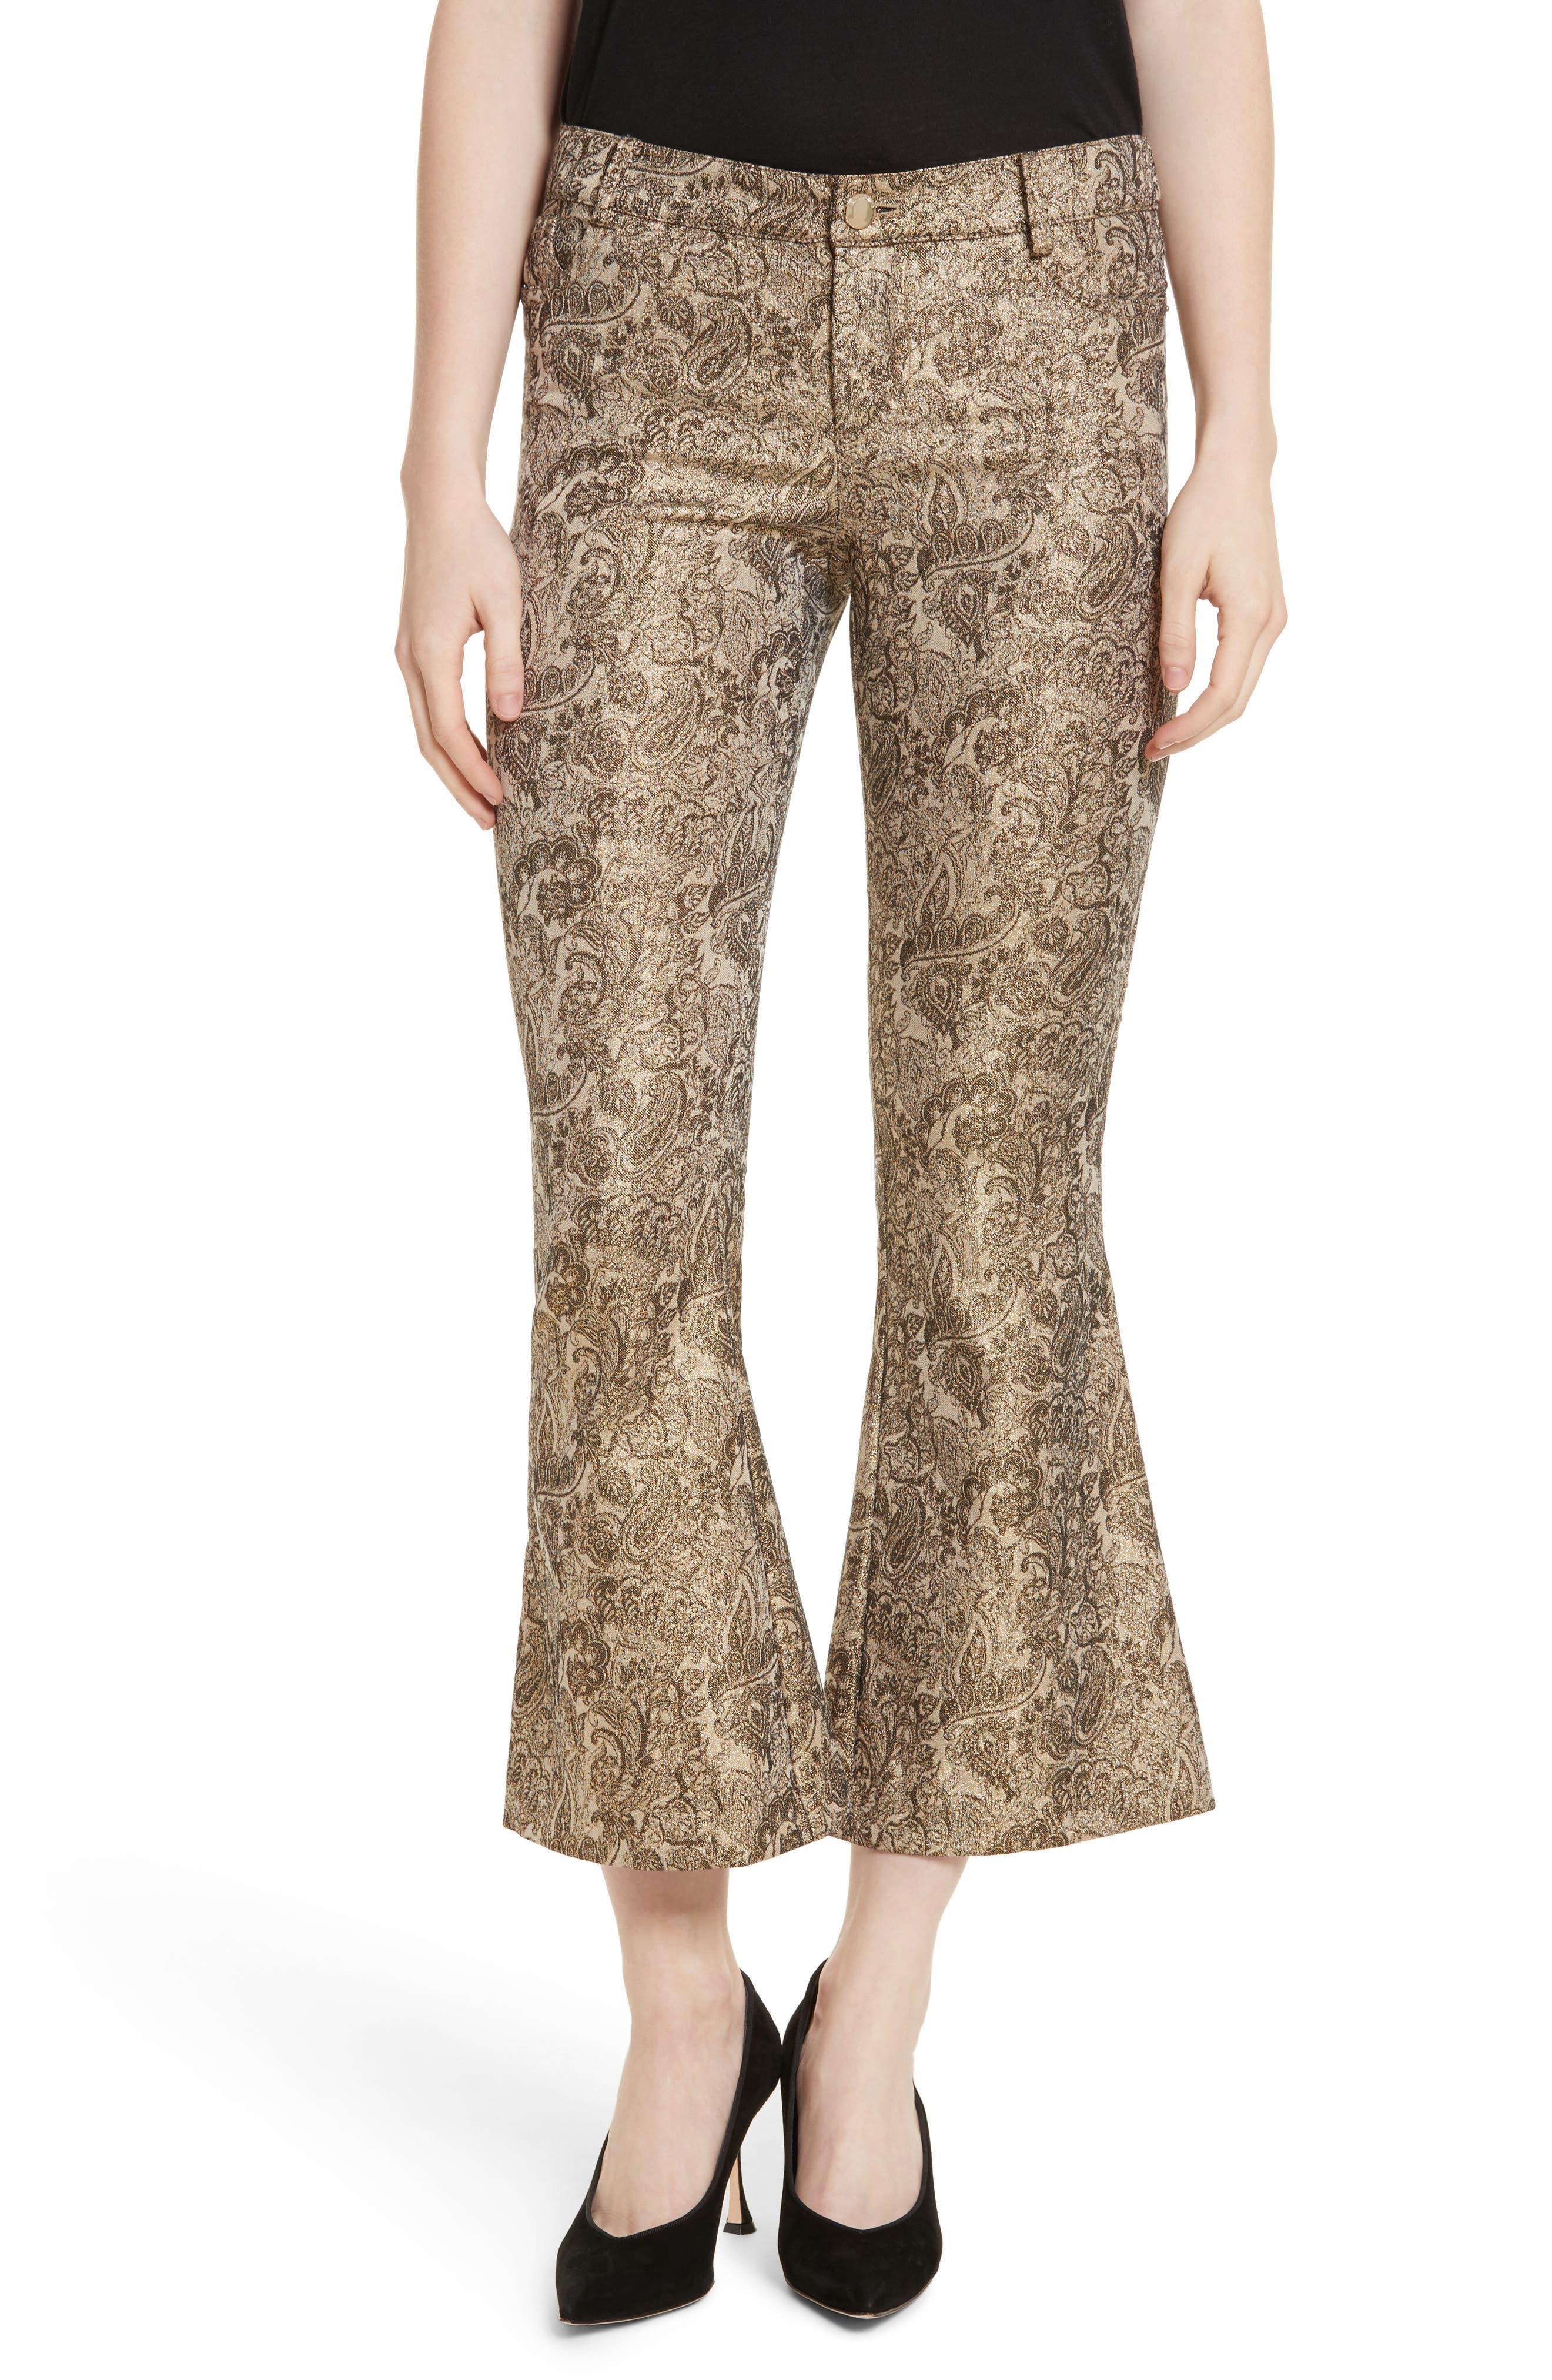 Alternate Image 1 Selected - Alice + Olivia Drew Metallic Crop Bell Pants